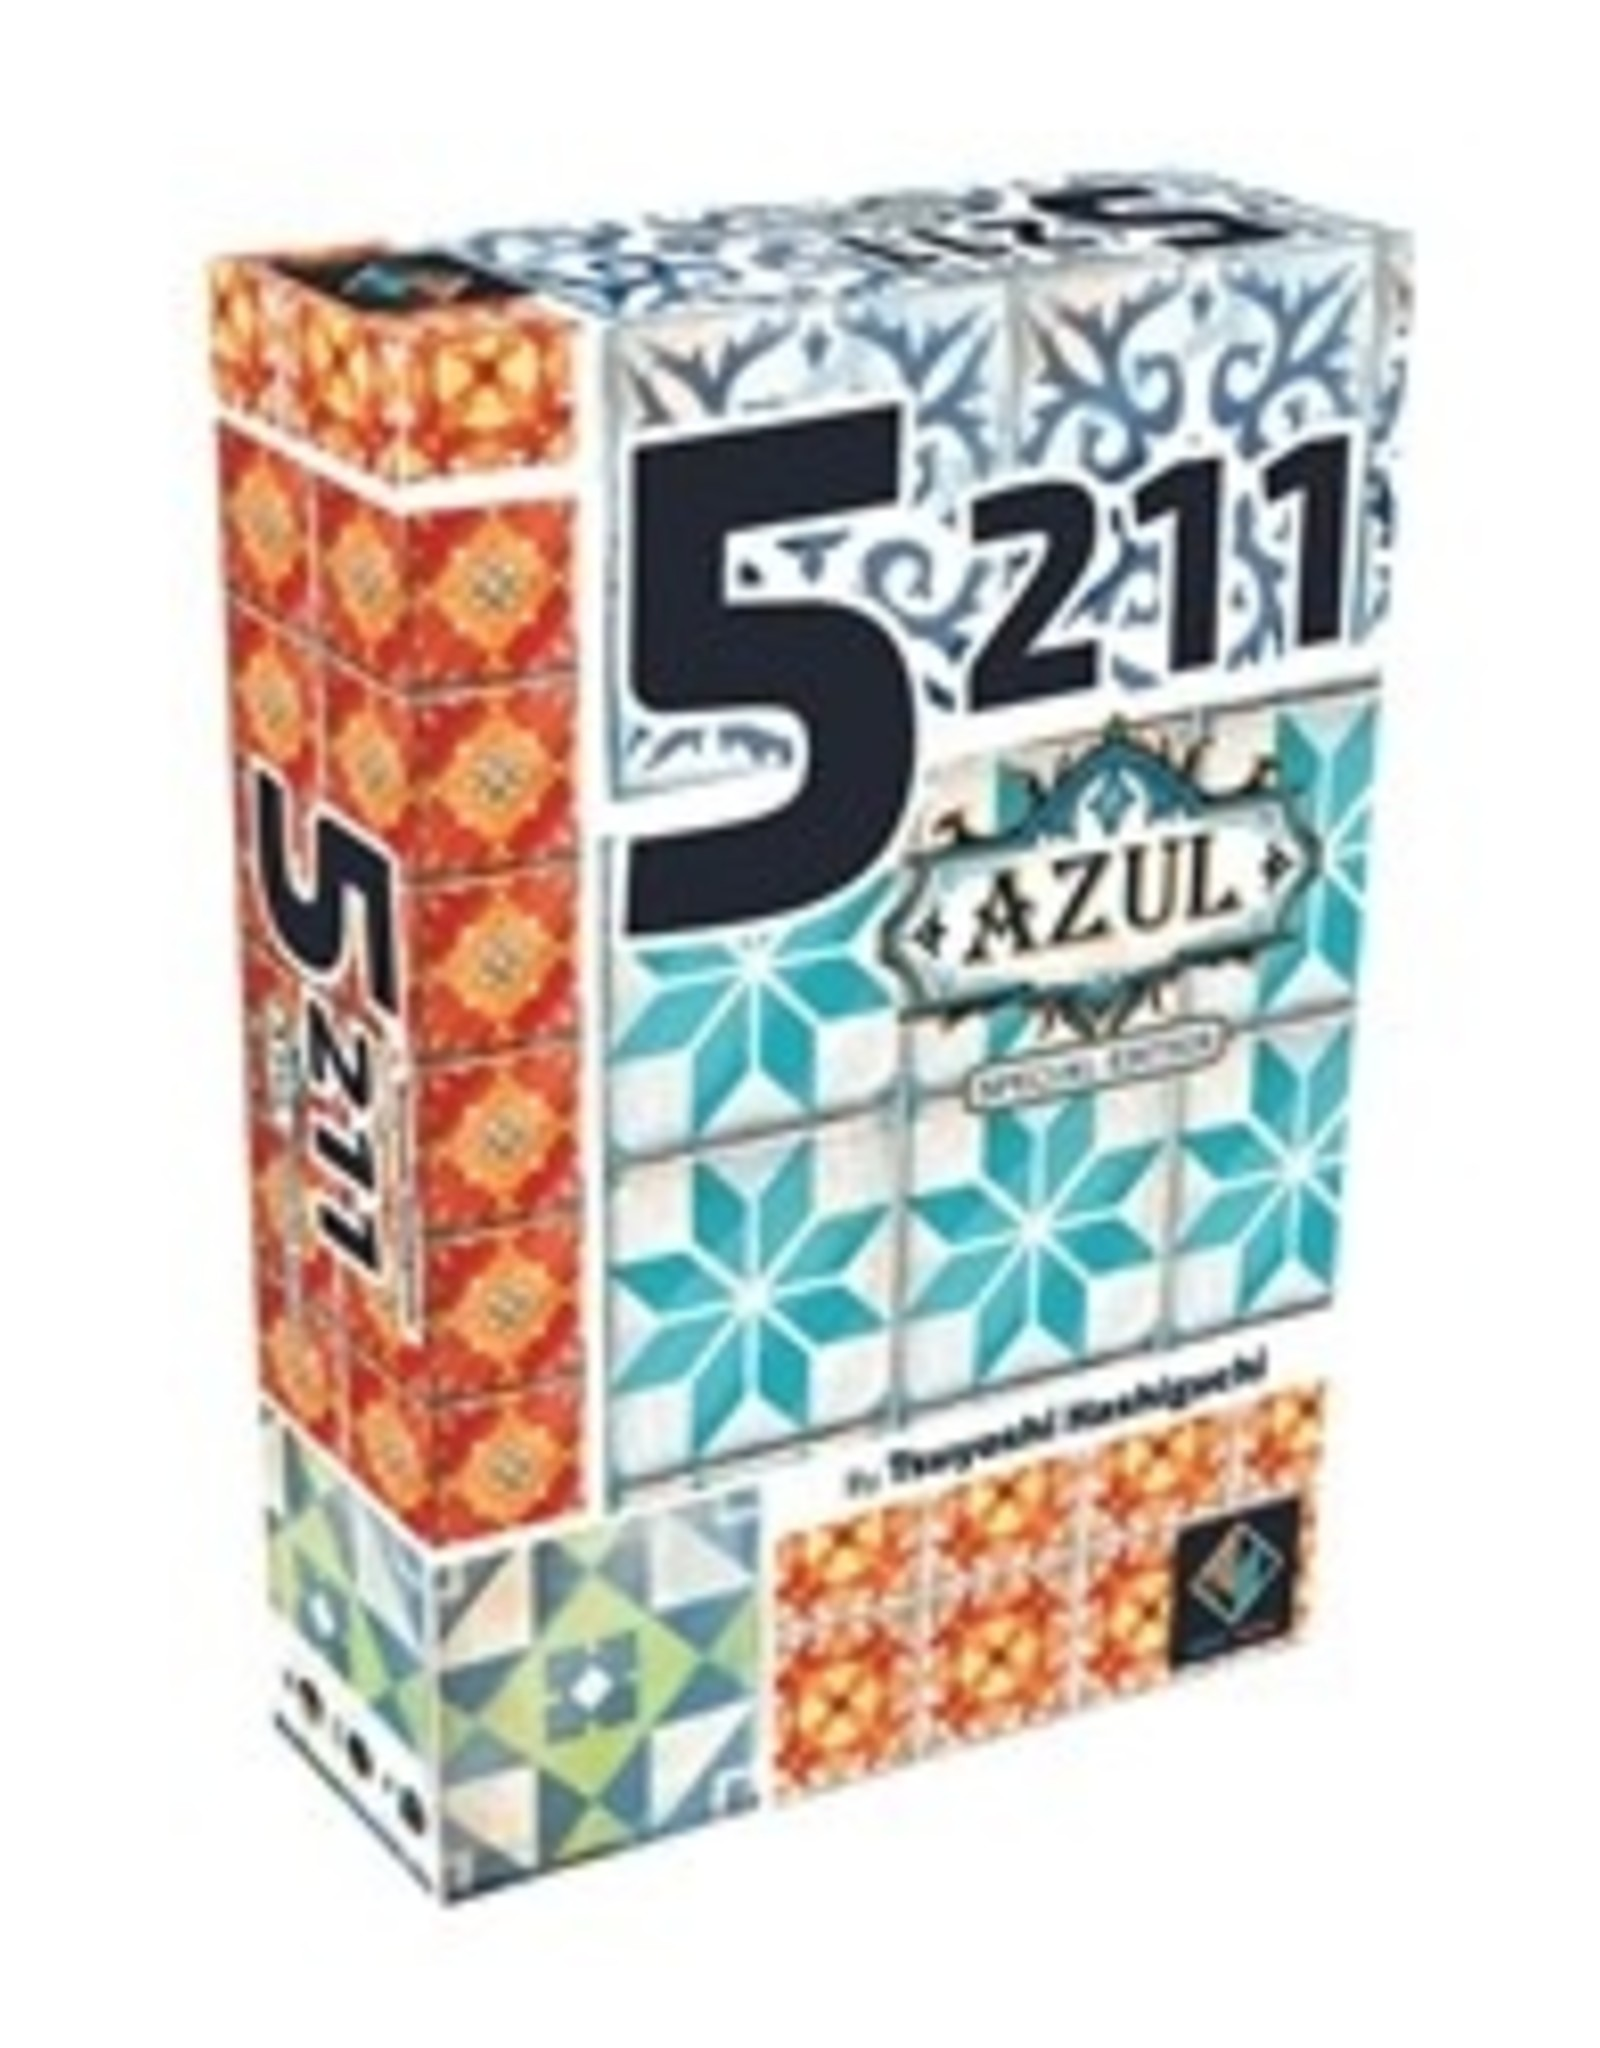 Asmodee 5211 - Azul Edition